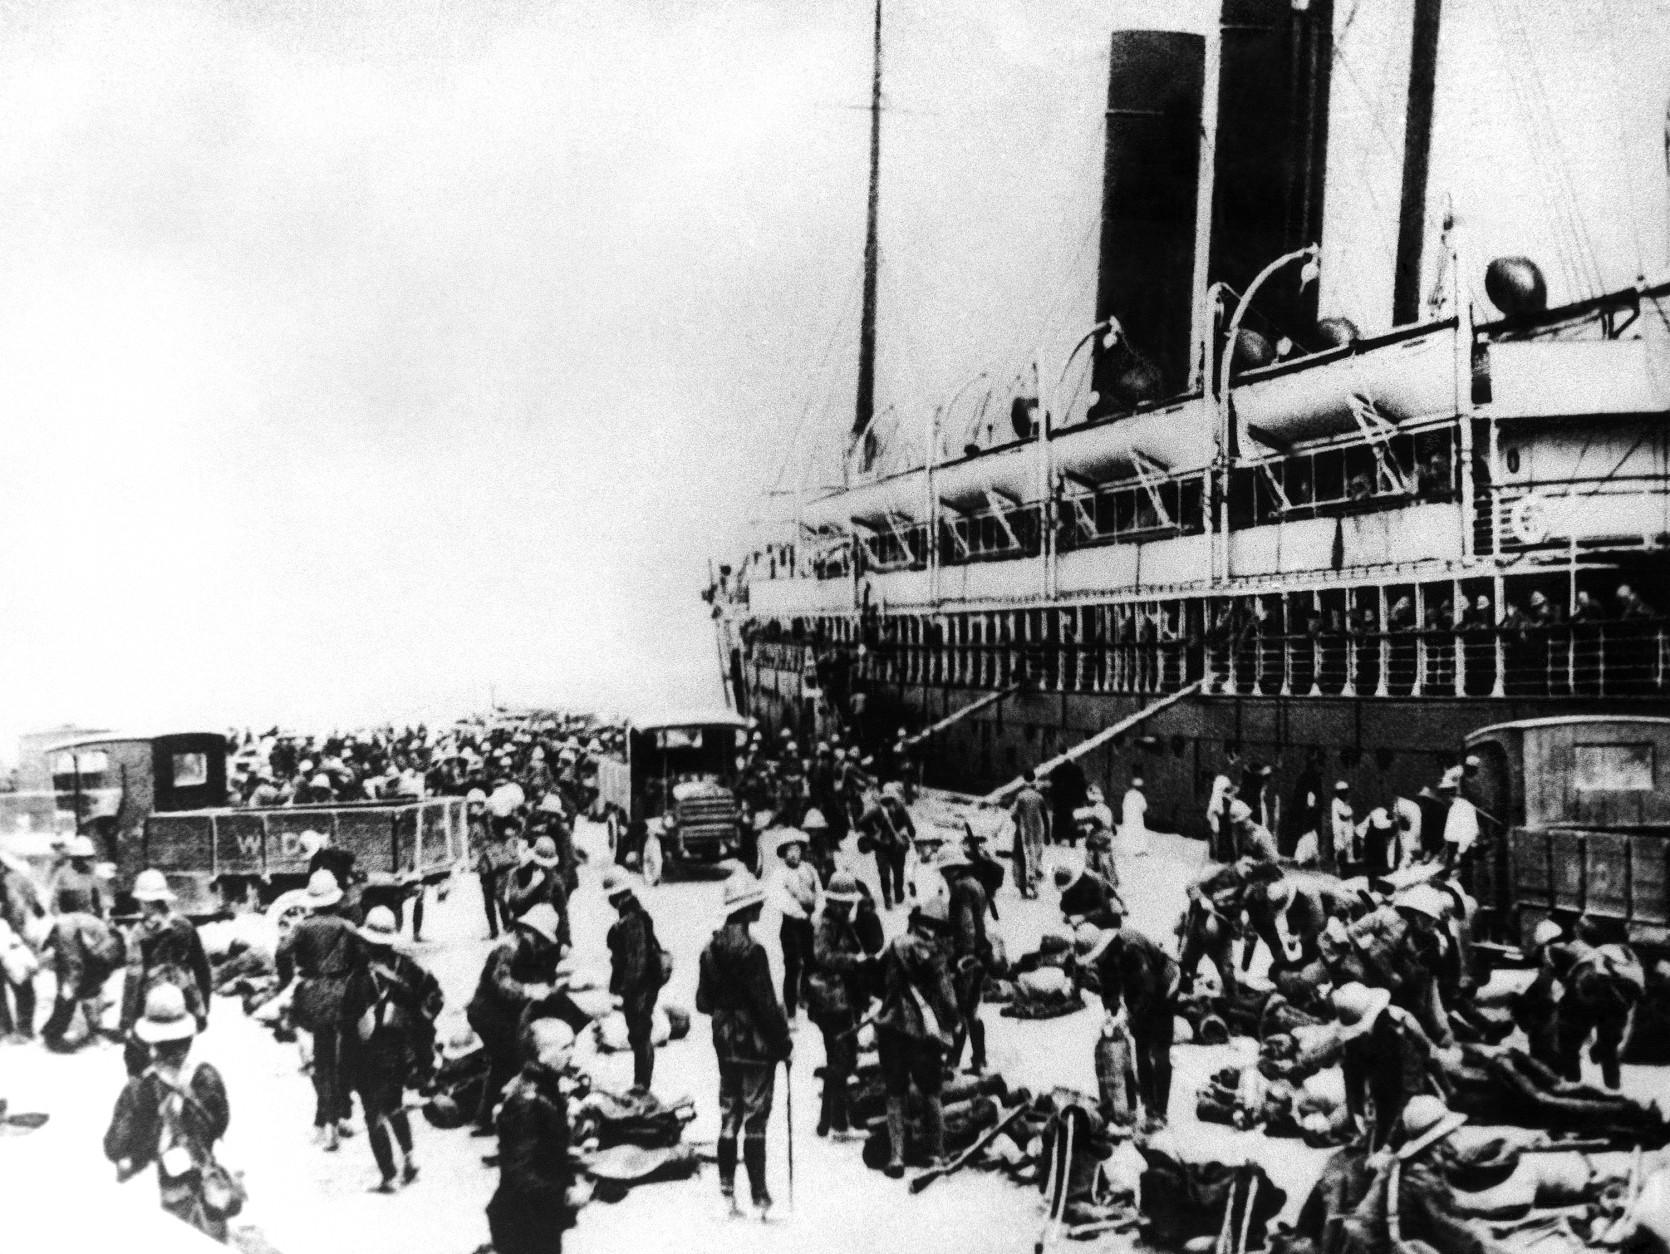 Australian troops arrive in Alexandria, Egypt, en route to the battlefield on the Gallipoli Peninsula in 1915. Thousands died in the nightmare battle of World War I. (AP Photo)